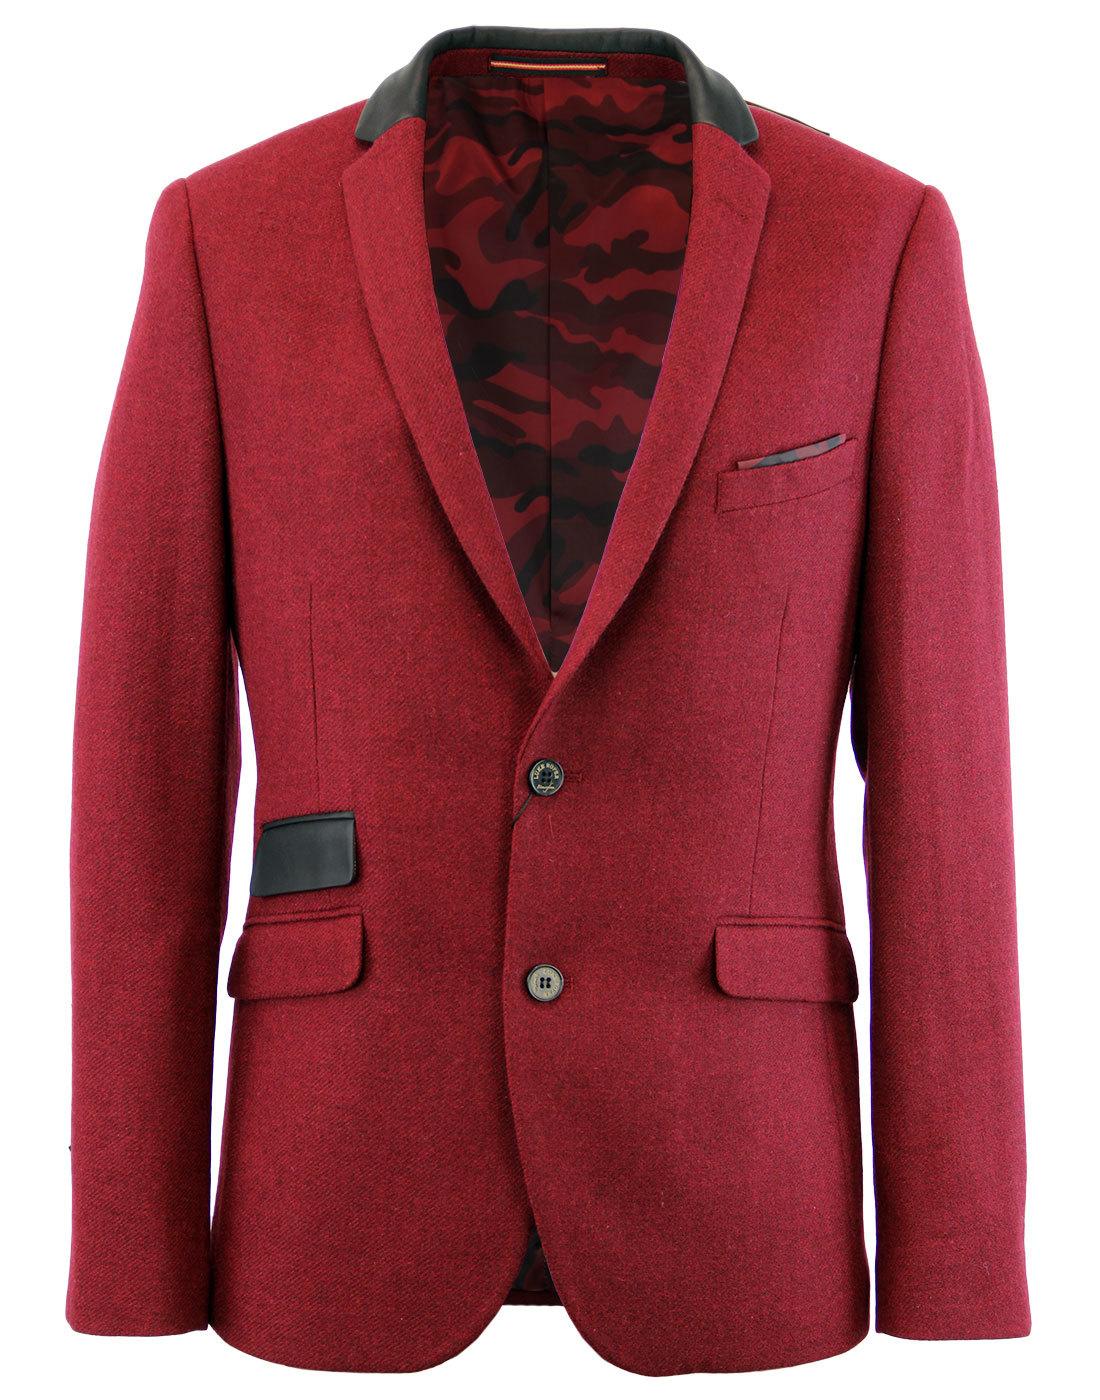 LUKE 1977 Soeron 2S Retro Mod Tweed 2 Button Blazer Jacket Shiraz f8596f678